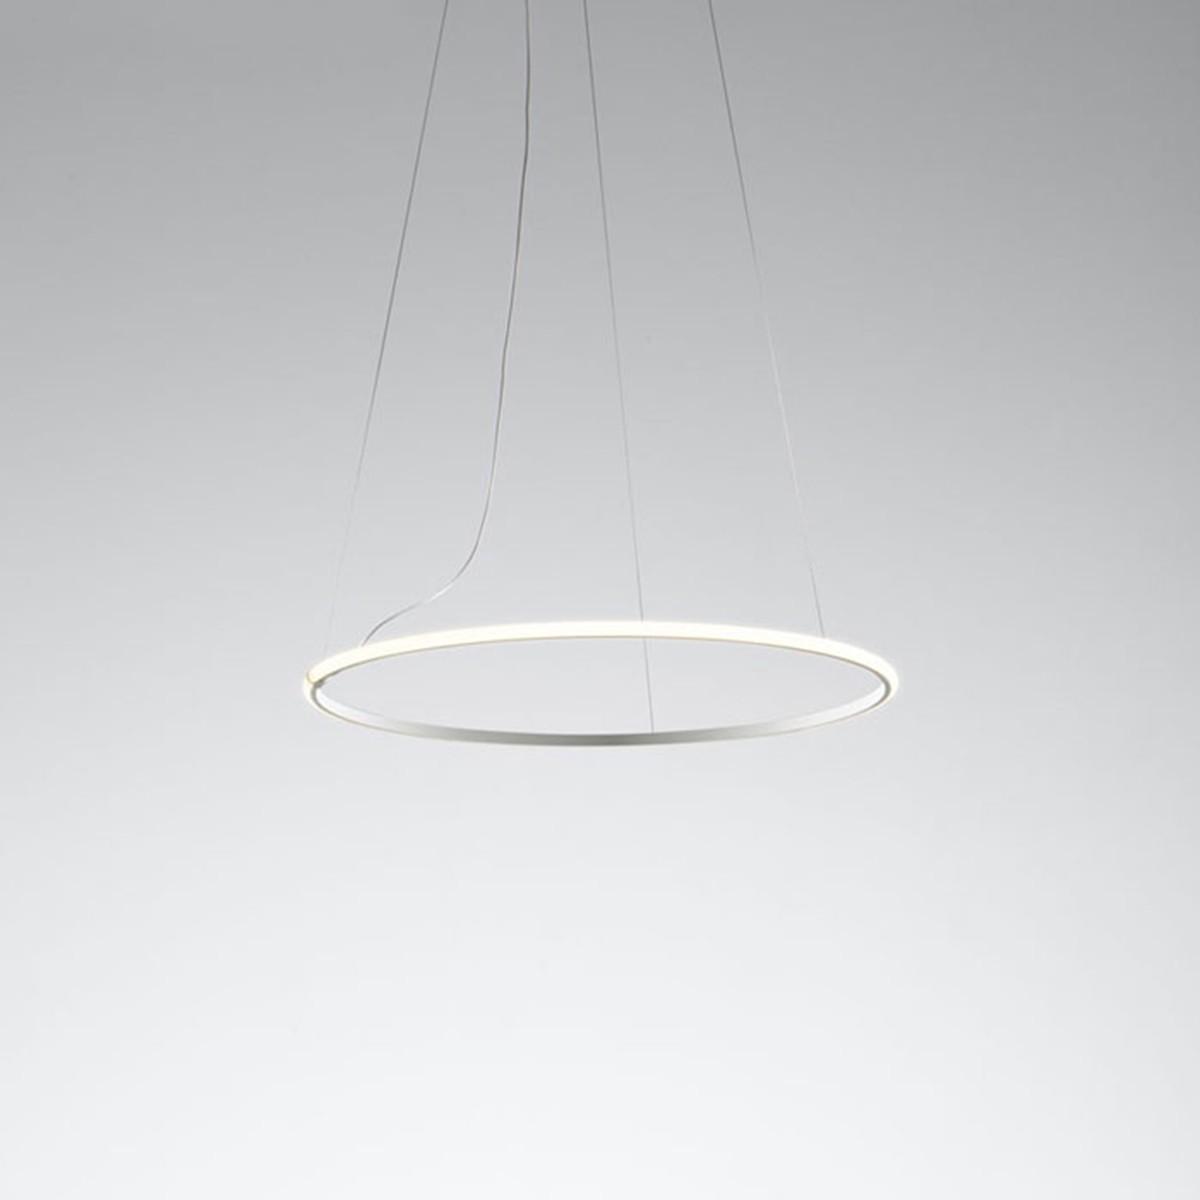 Fabbian Olympic Pendelleuchte, 1-flg., Ø: 80,2 cm, weiß